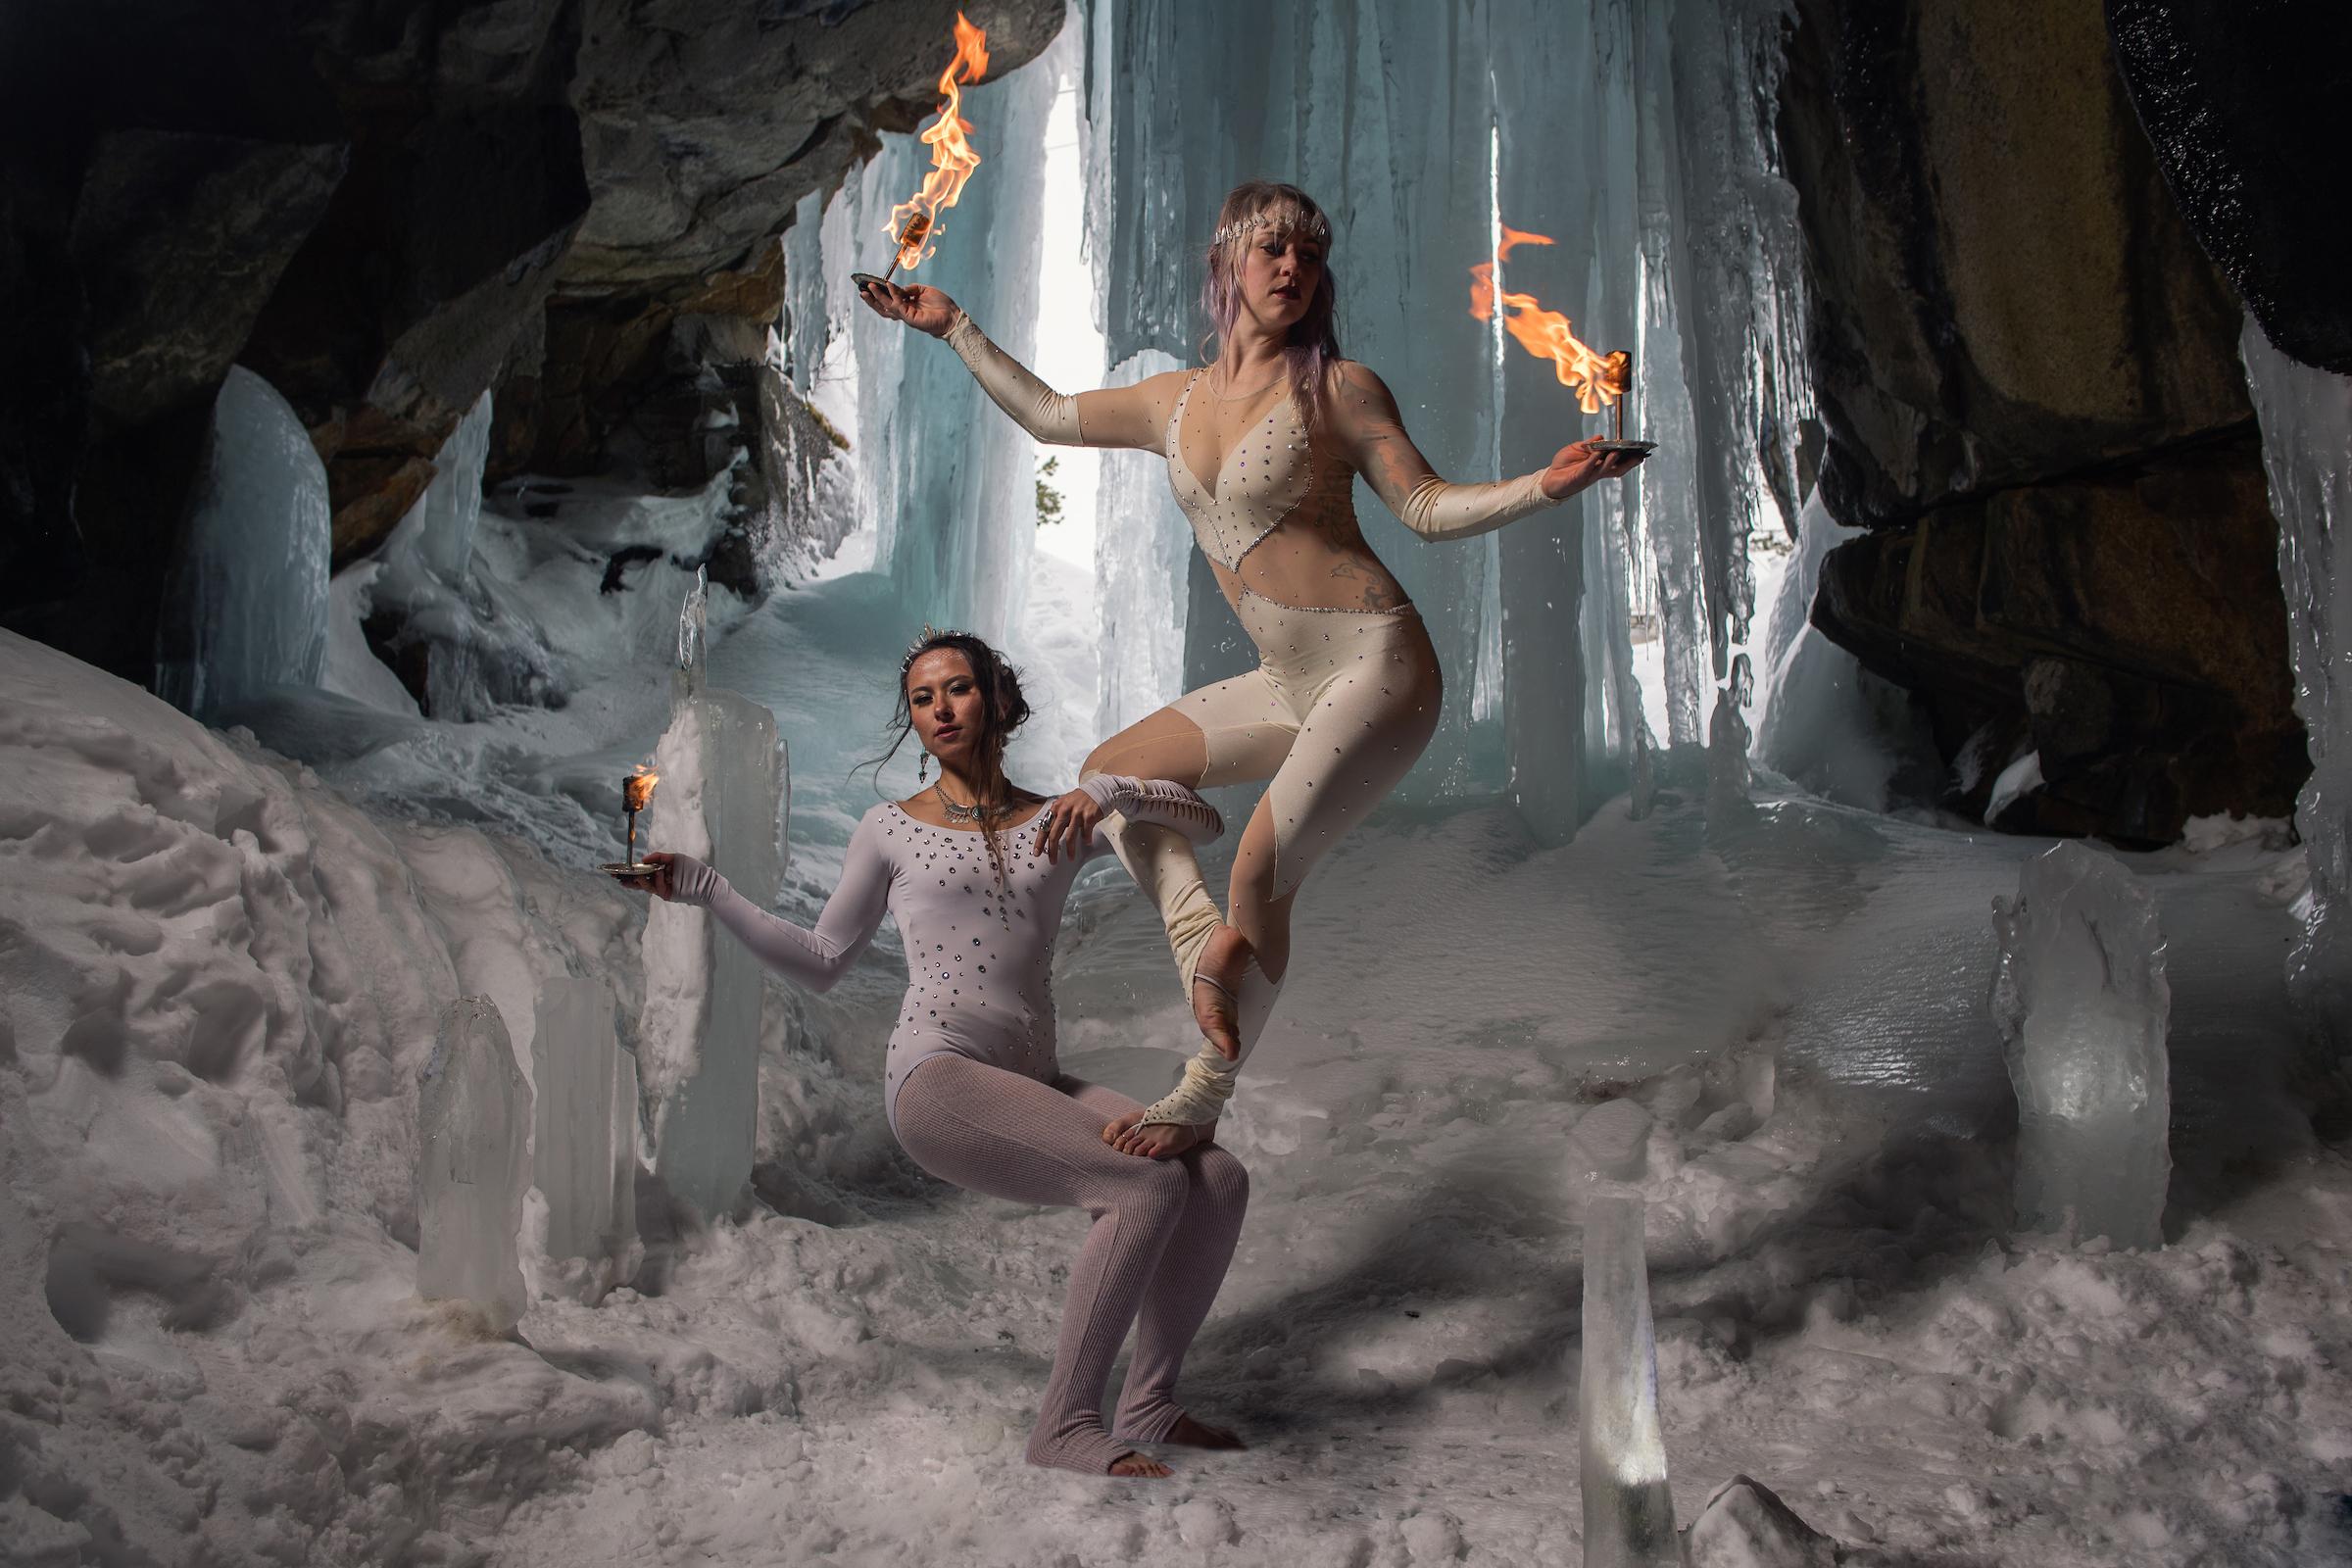 ice  30440 .jpg